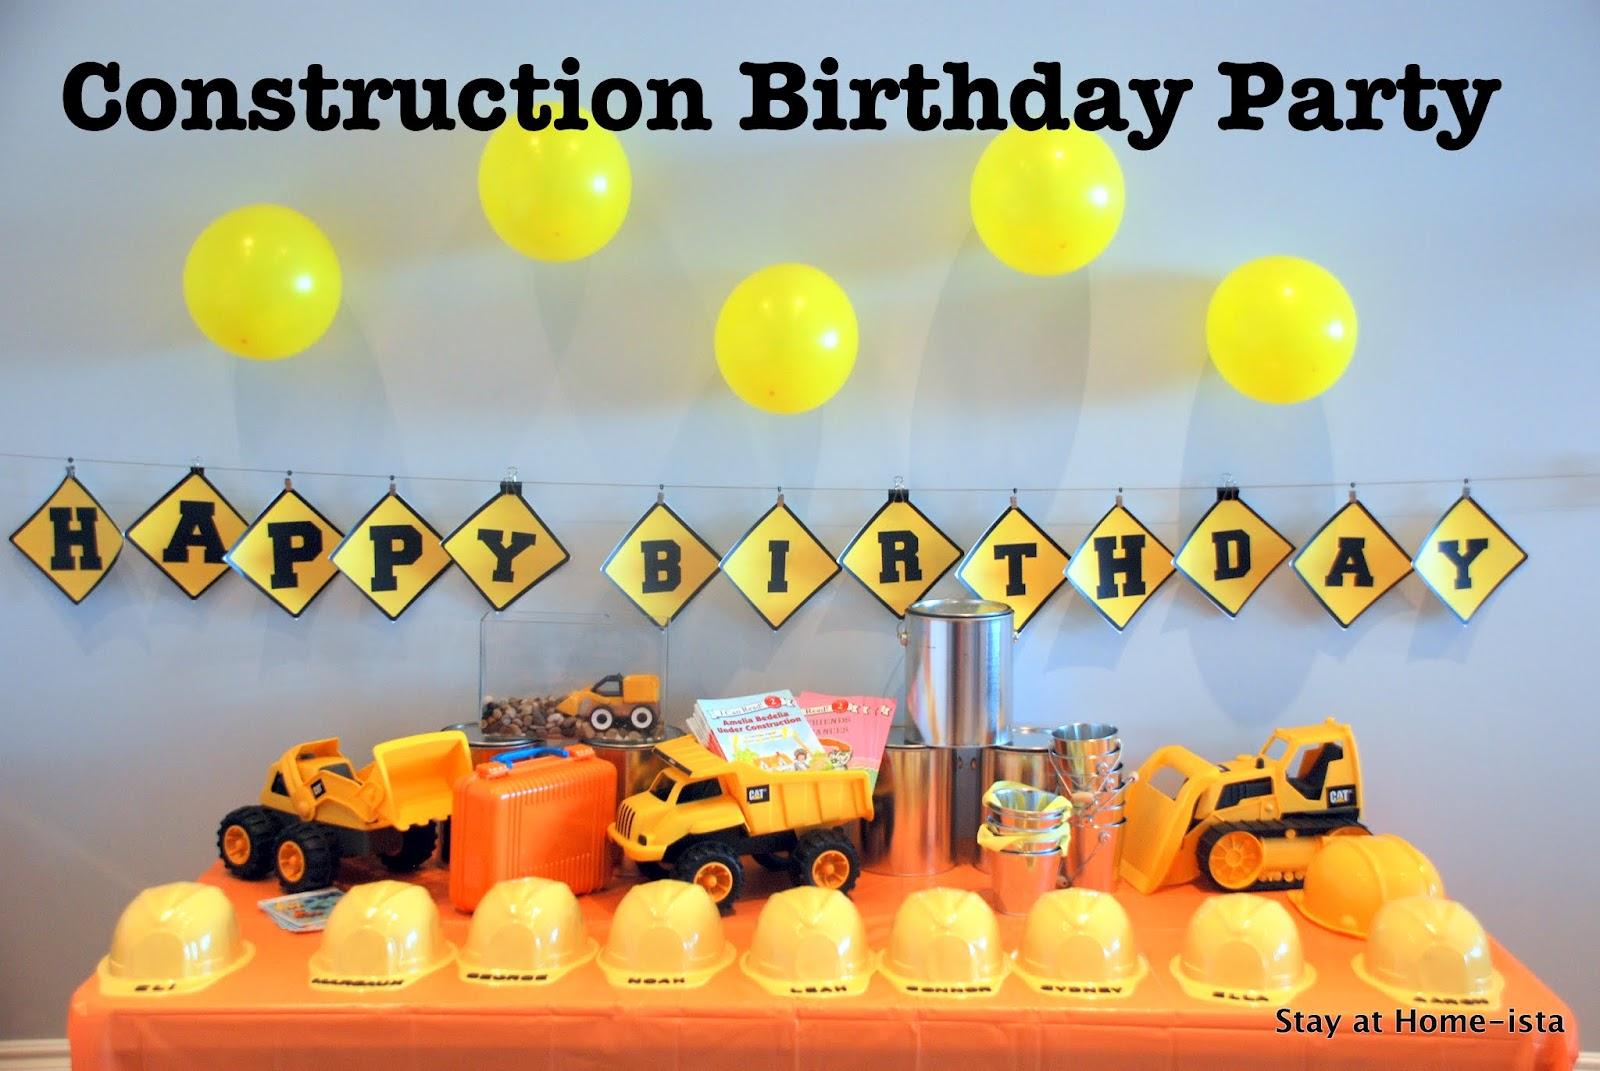 Construction Machine Birthday Party